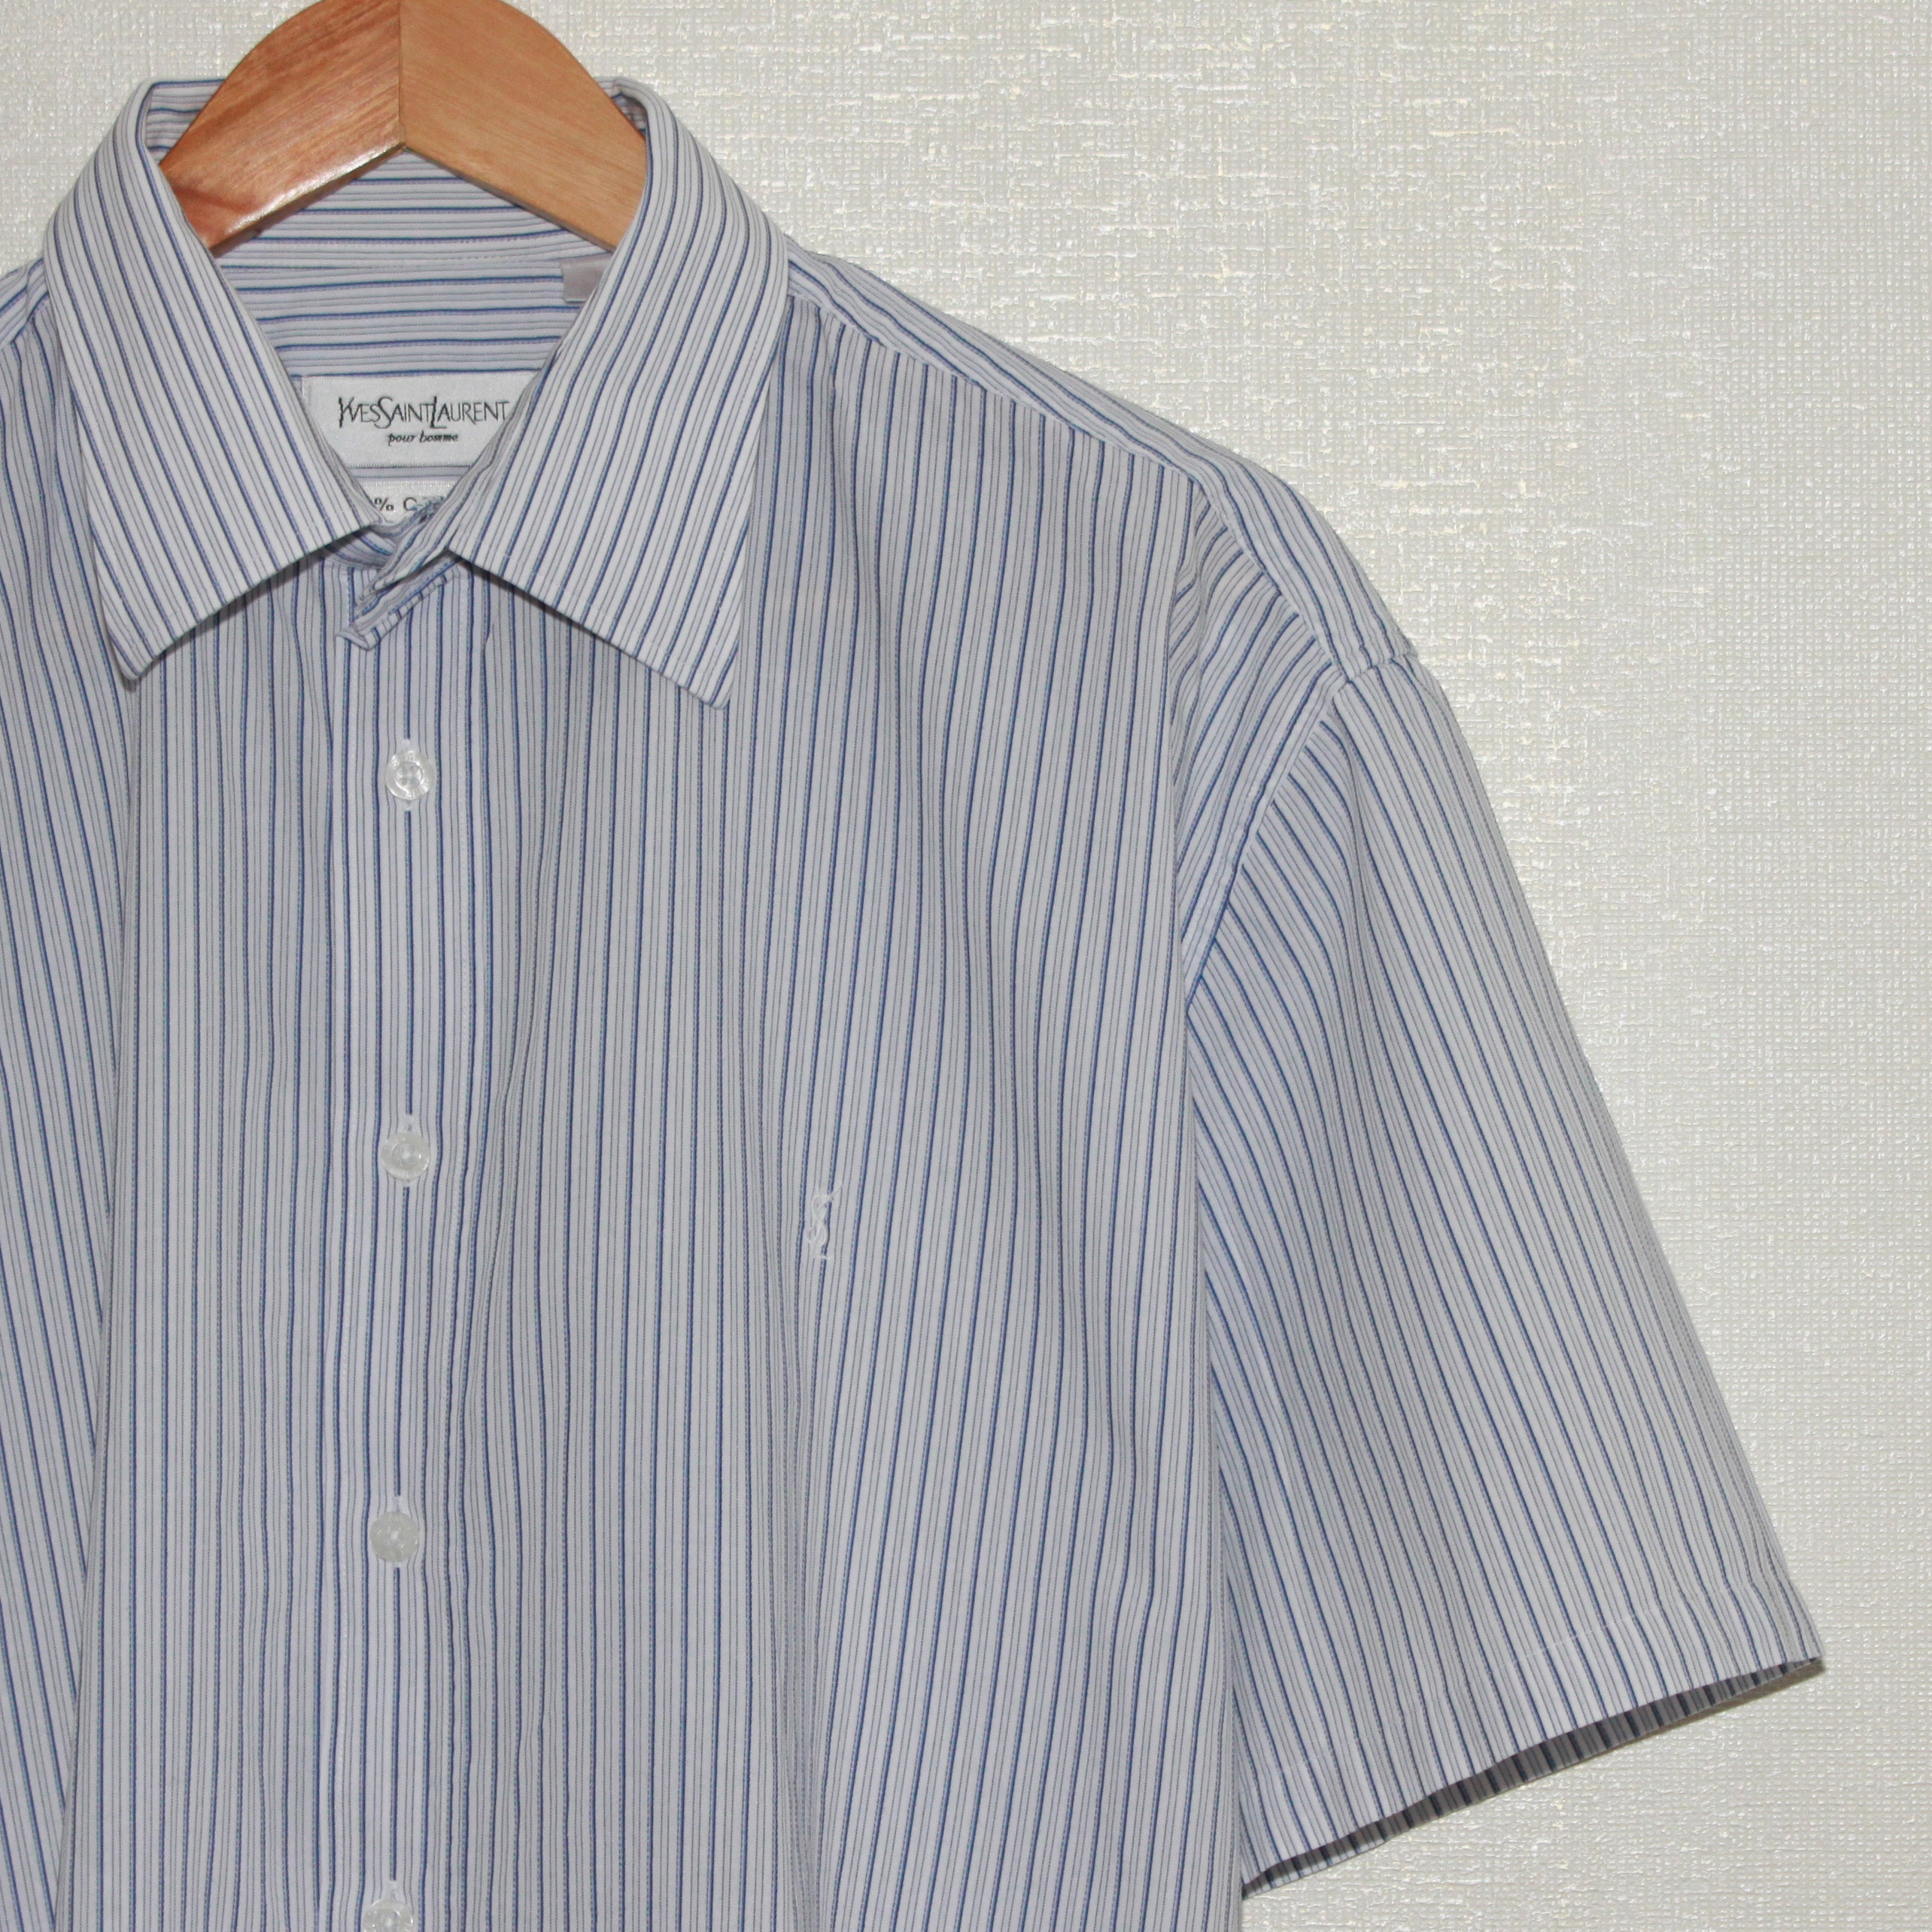 02e6fe9b1c8 Vintage Vintage Ysl Yves Saint Laurent Mens Striped Short Sleeve ...